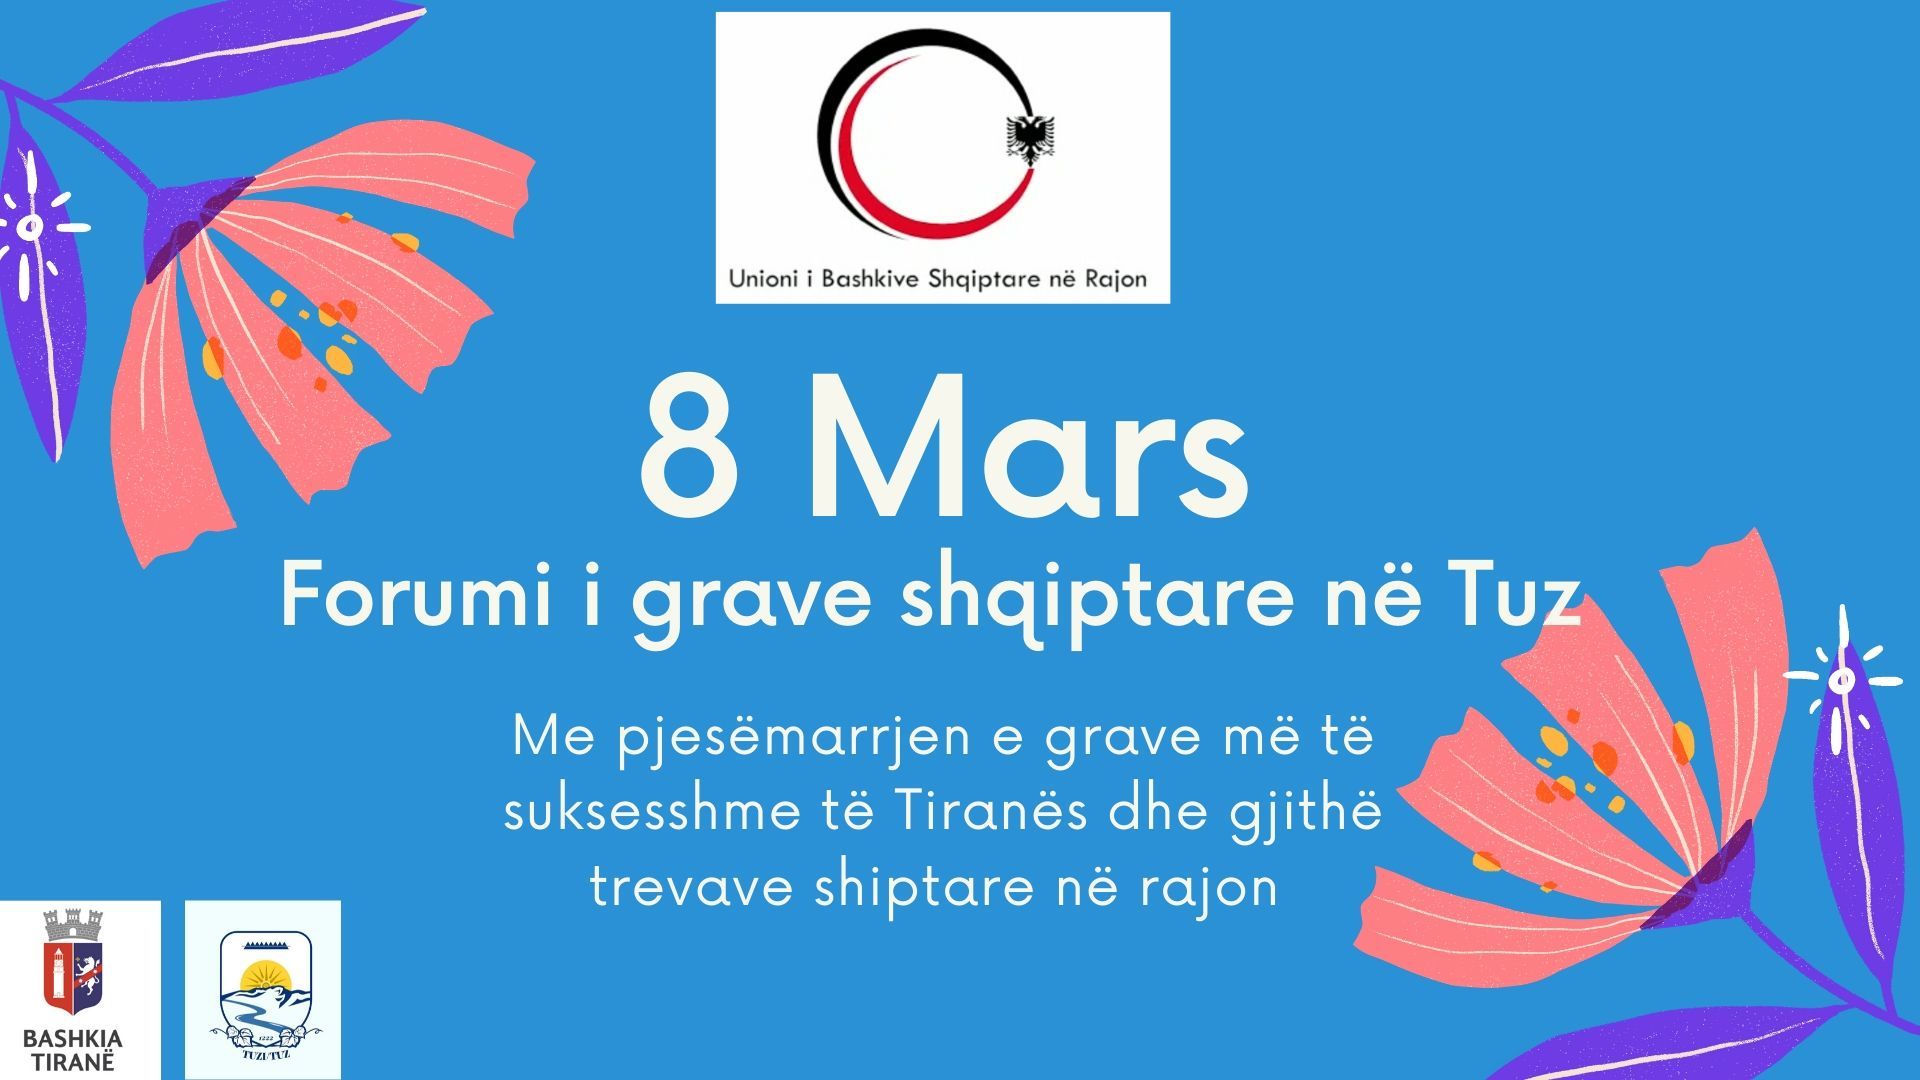 Forumi i grave te biznesit Tiranes ne Tuz